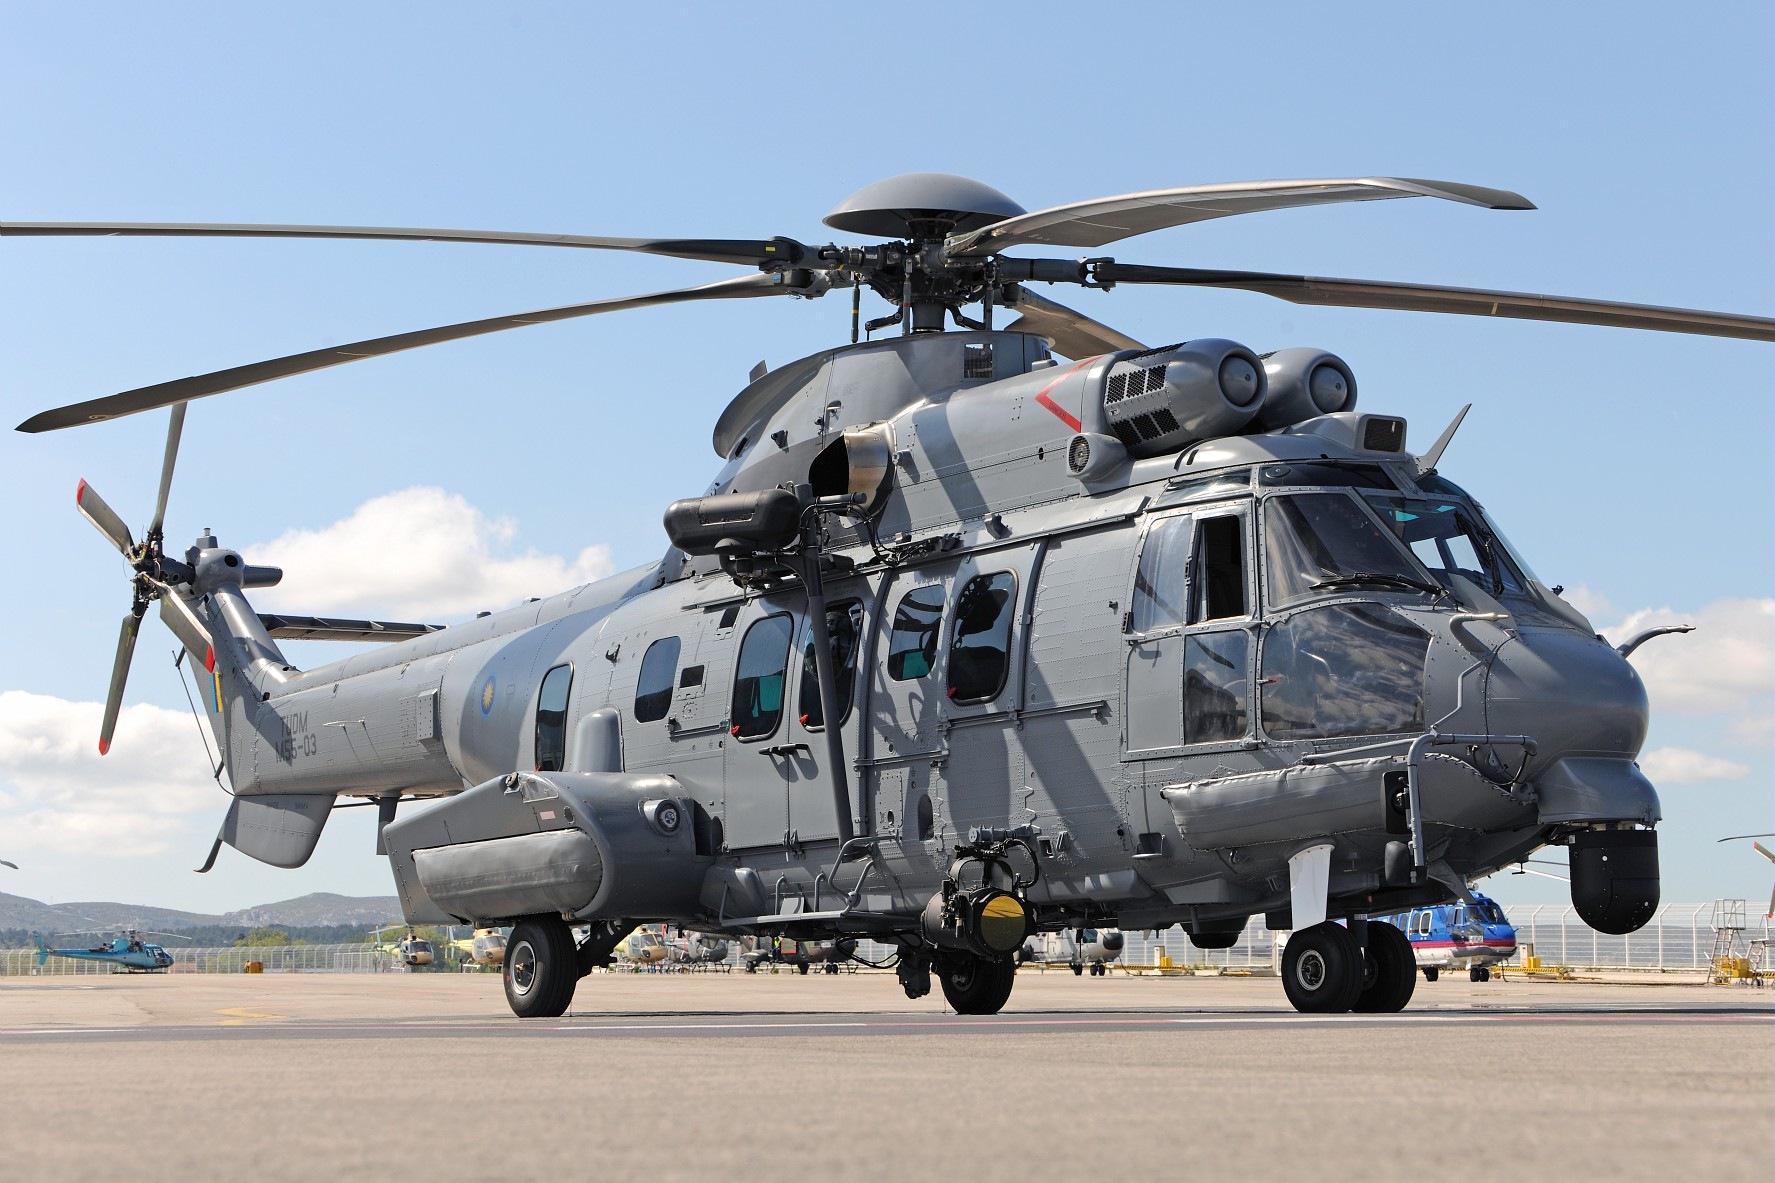 Кувейт подписал контракт на 30 вертолетов Airbus Helicopters Caracal